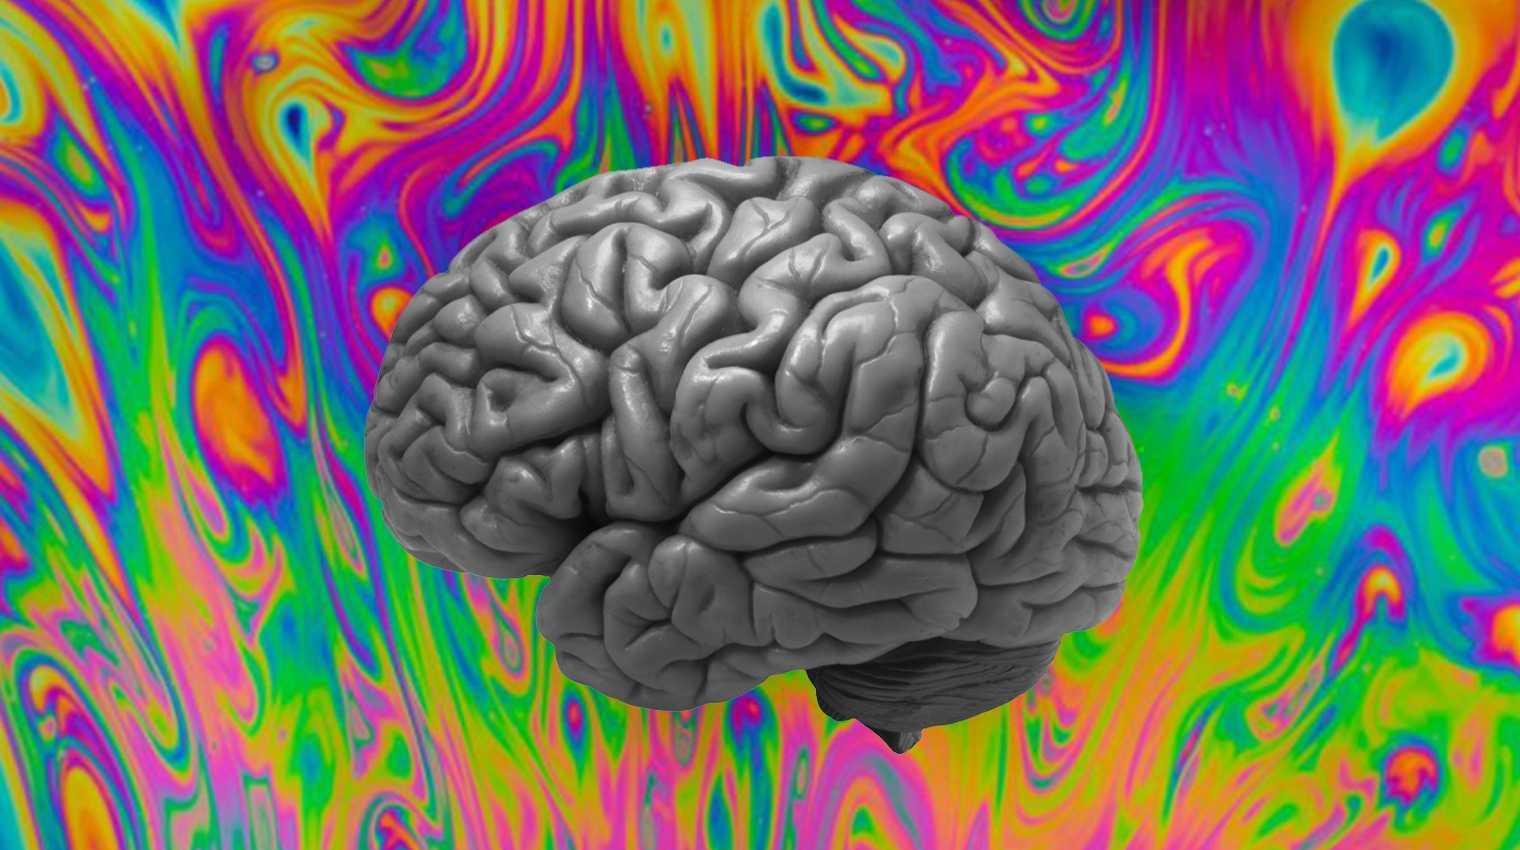 LSD: Πώς επιδρά η ναρκωτική ουσία στον εγκέφαλο και γιατί δοκιμάζεται από τους επιστήμονες;